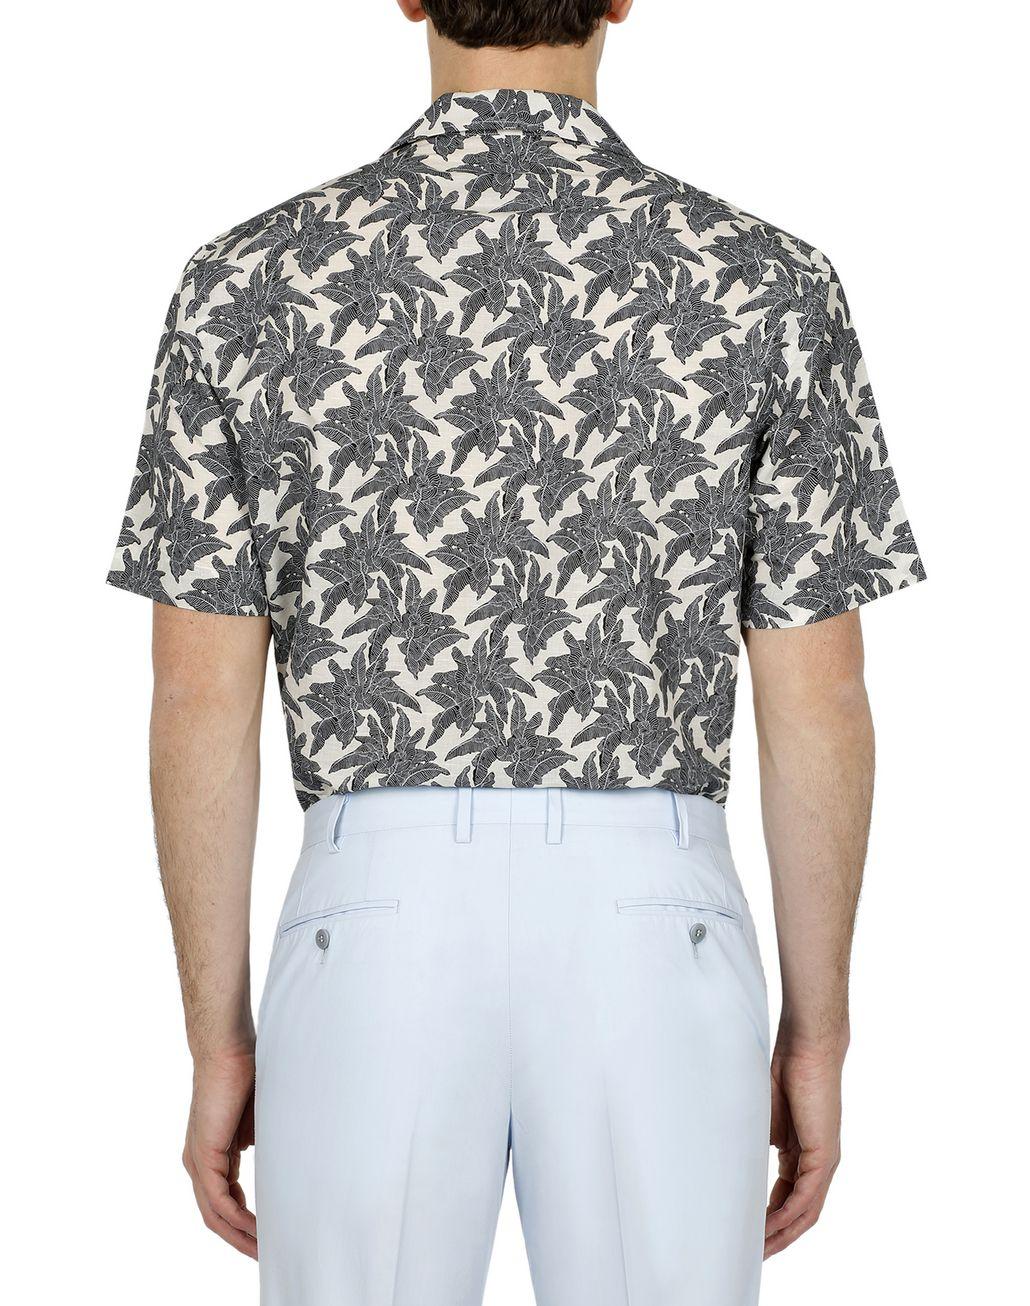 BRIONI Brown Printed Short Sleeves Shirt Leisure shirt Man d